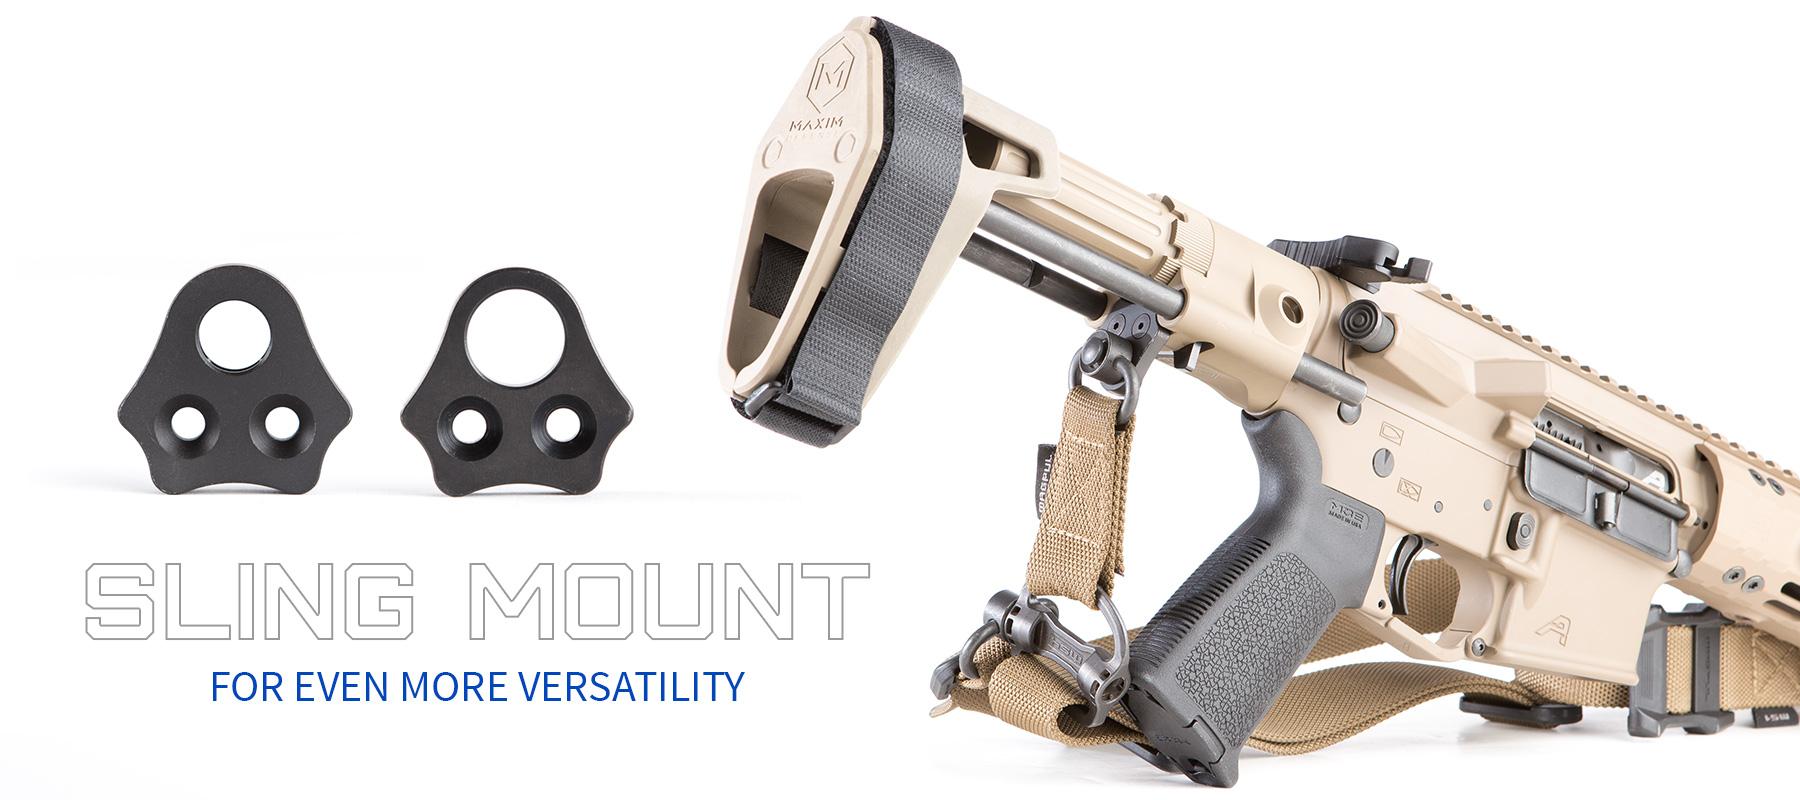 Maxim Defense CQB with sling